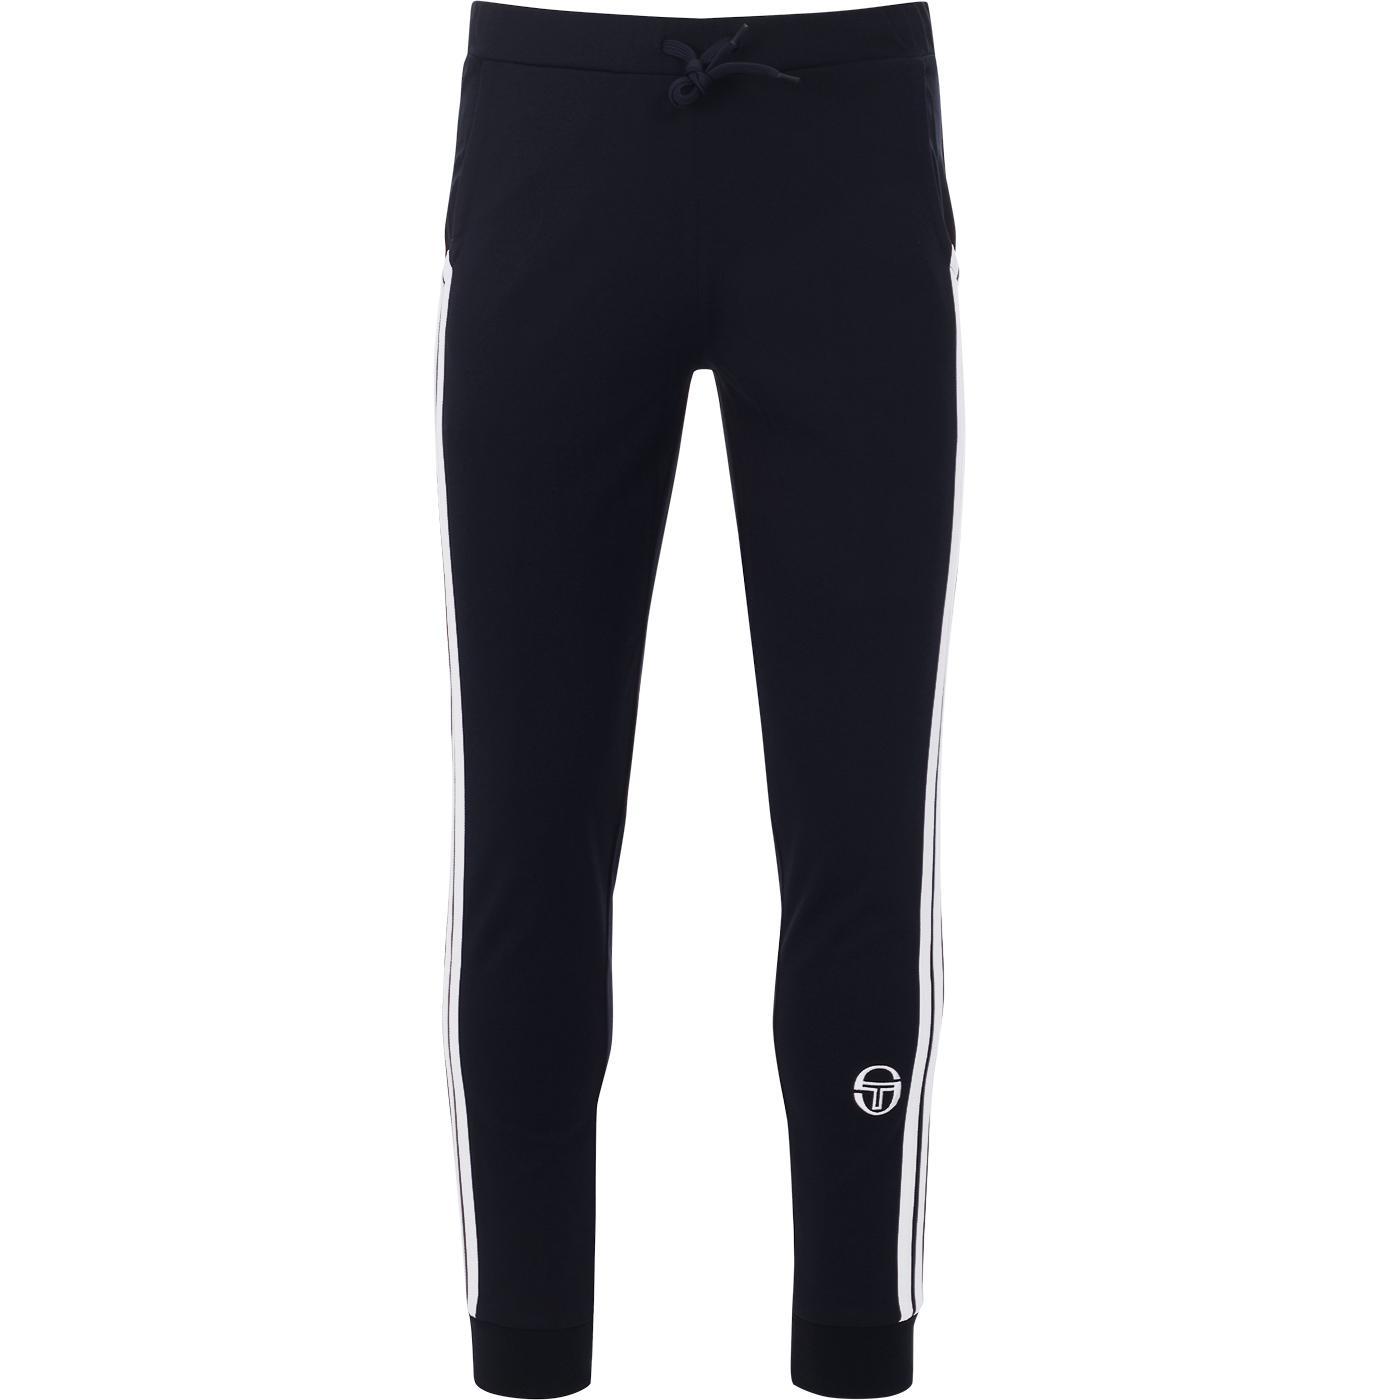 Damarindo SERGIO TACCHINI Track Pants (Navy/White)